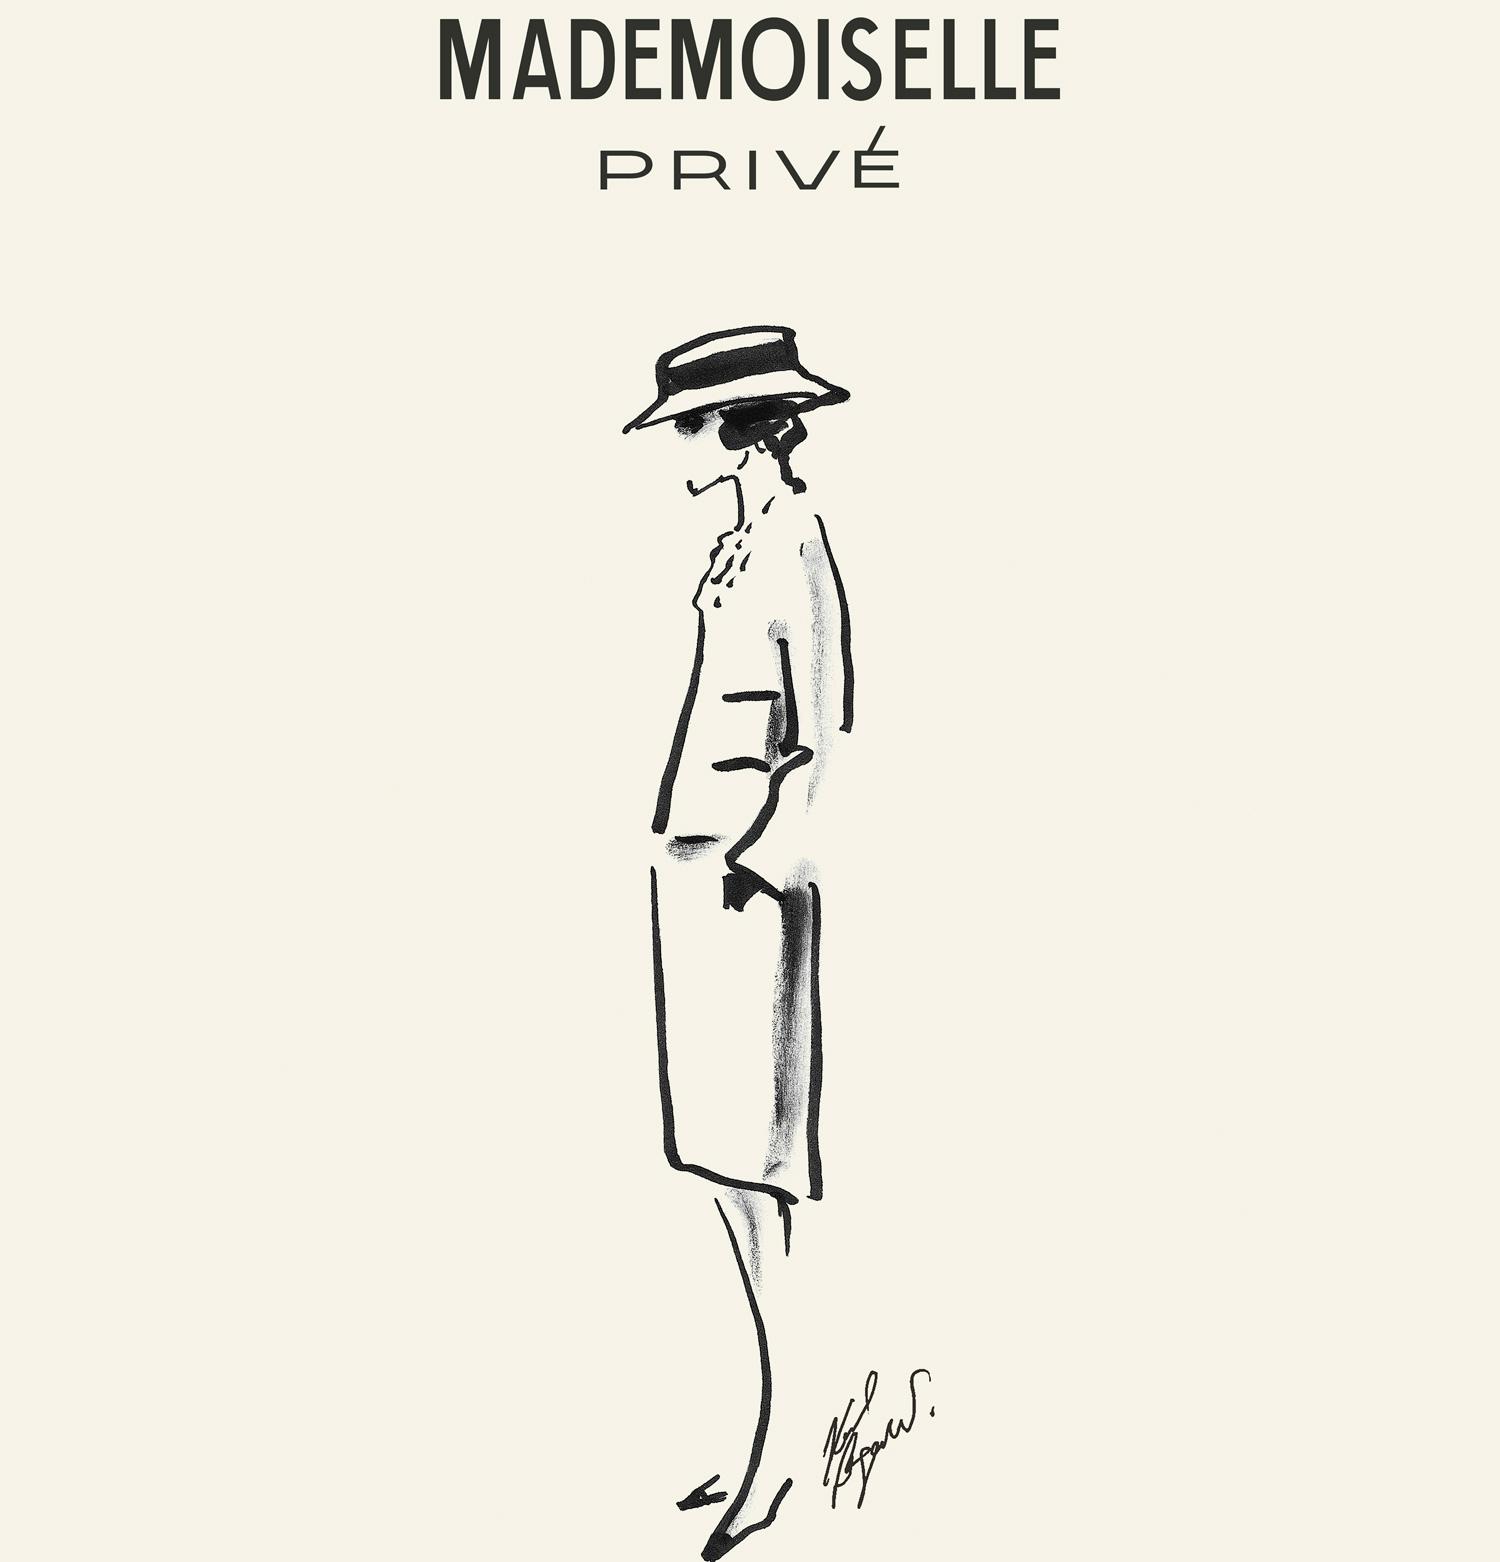 10-exposicoes-de-moda-para-ver-em-2015-mademoiselle-prive-chanel